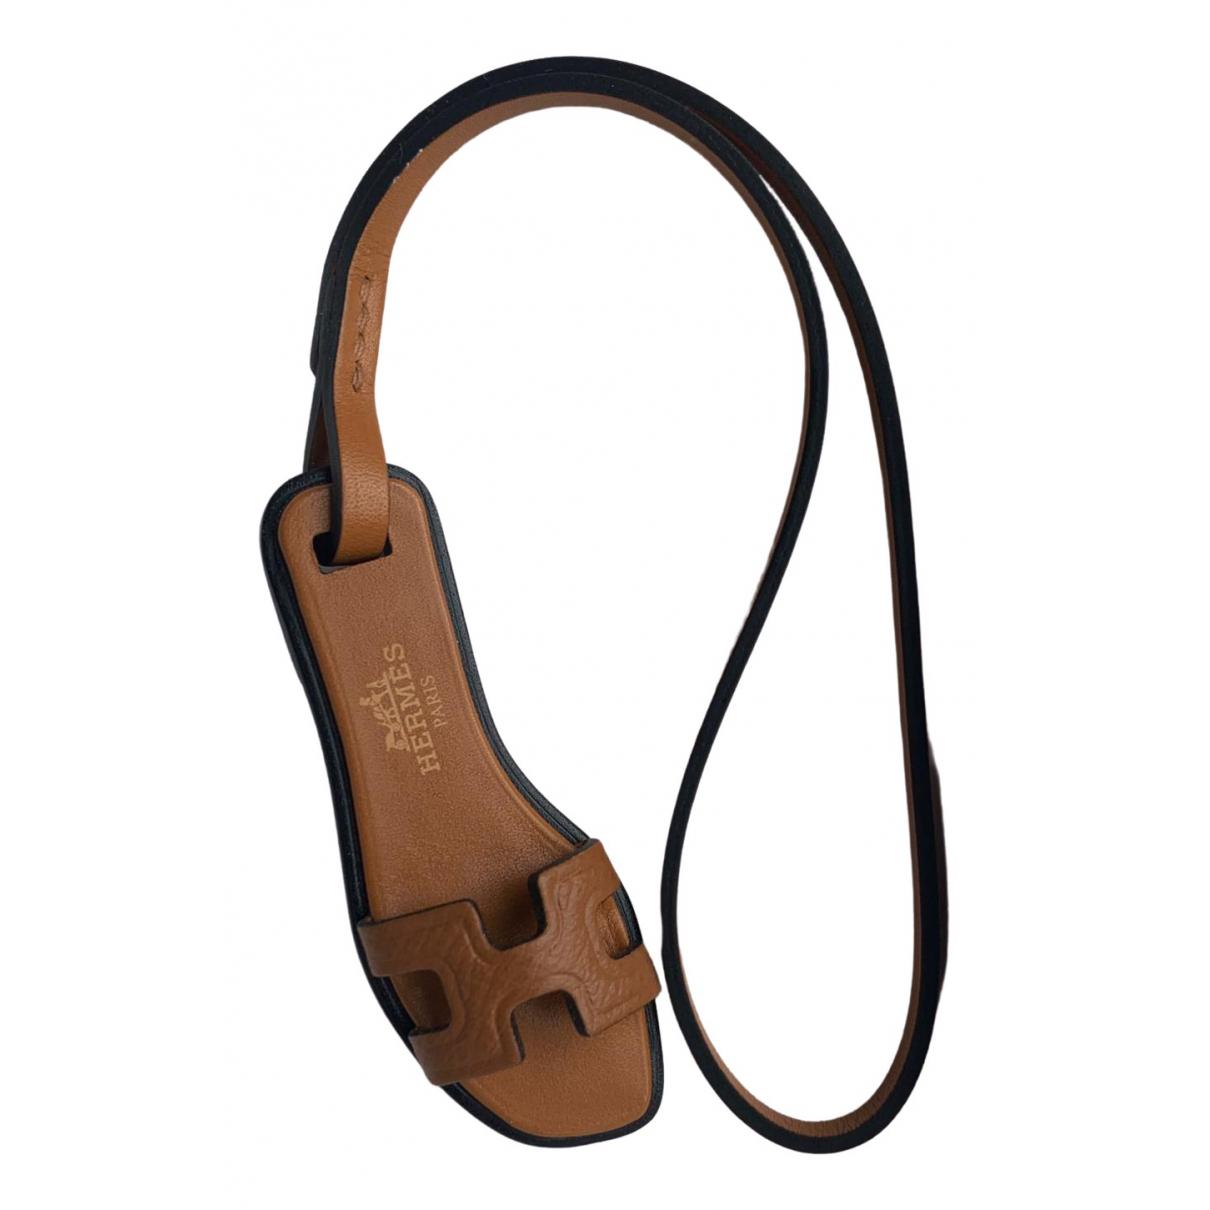 Hermes Oran Nano Charm Taschenschmuck in Leder